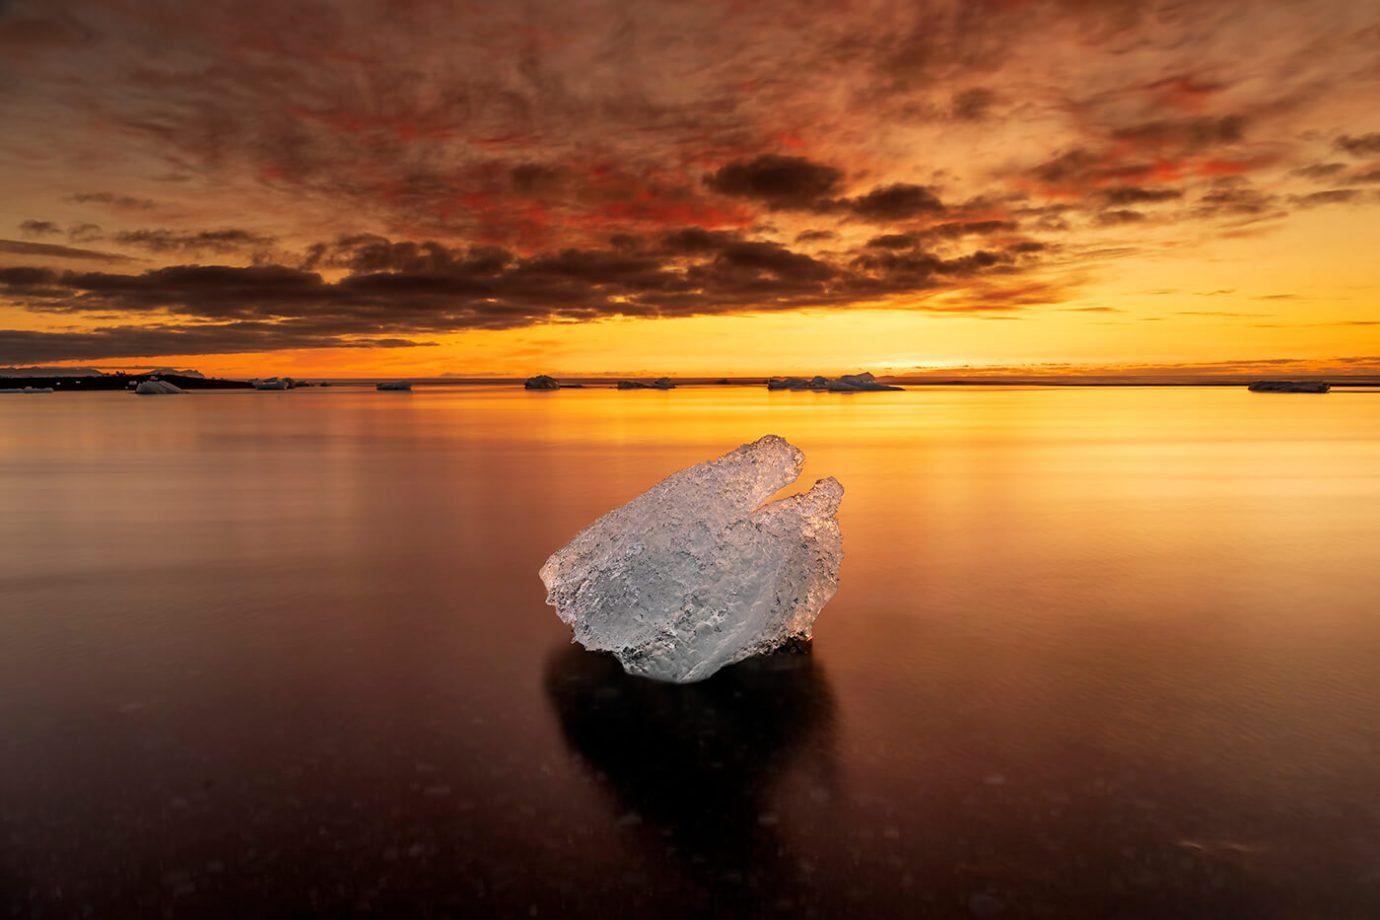 Southern Iceland & Northern Lights Photography Workshop